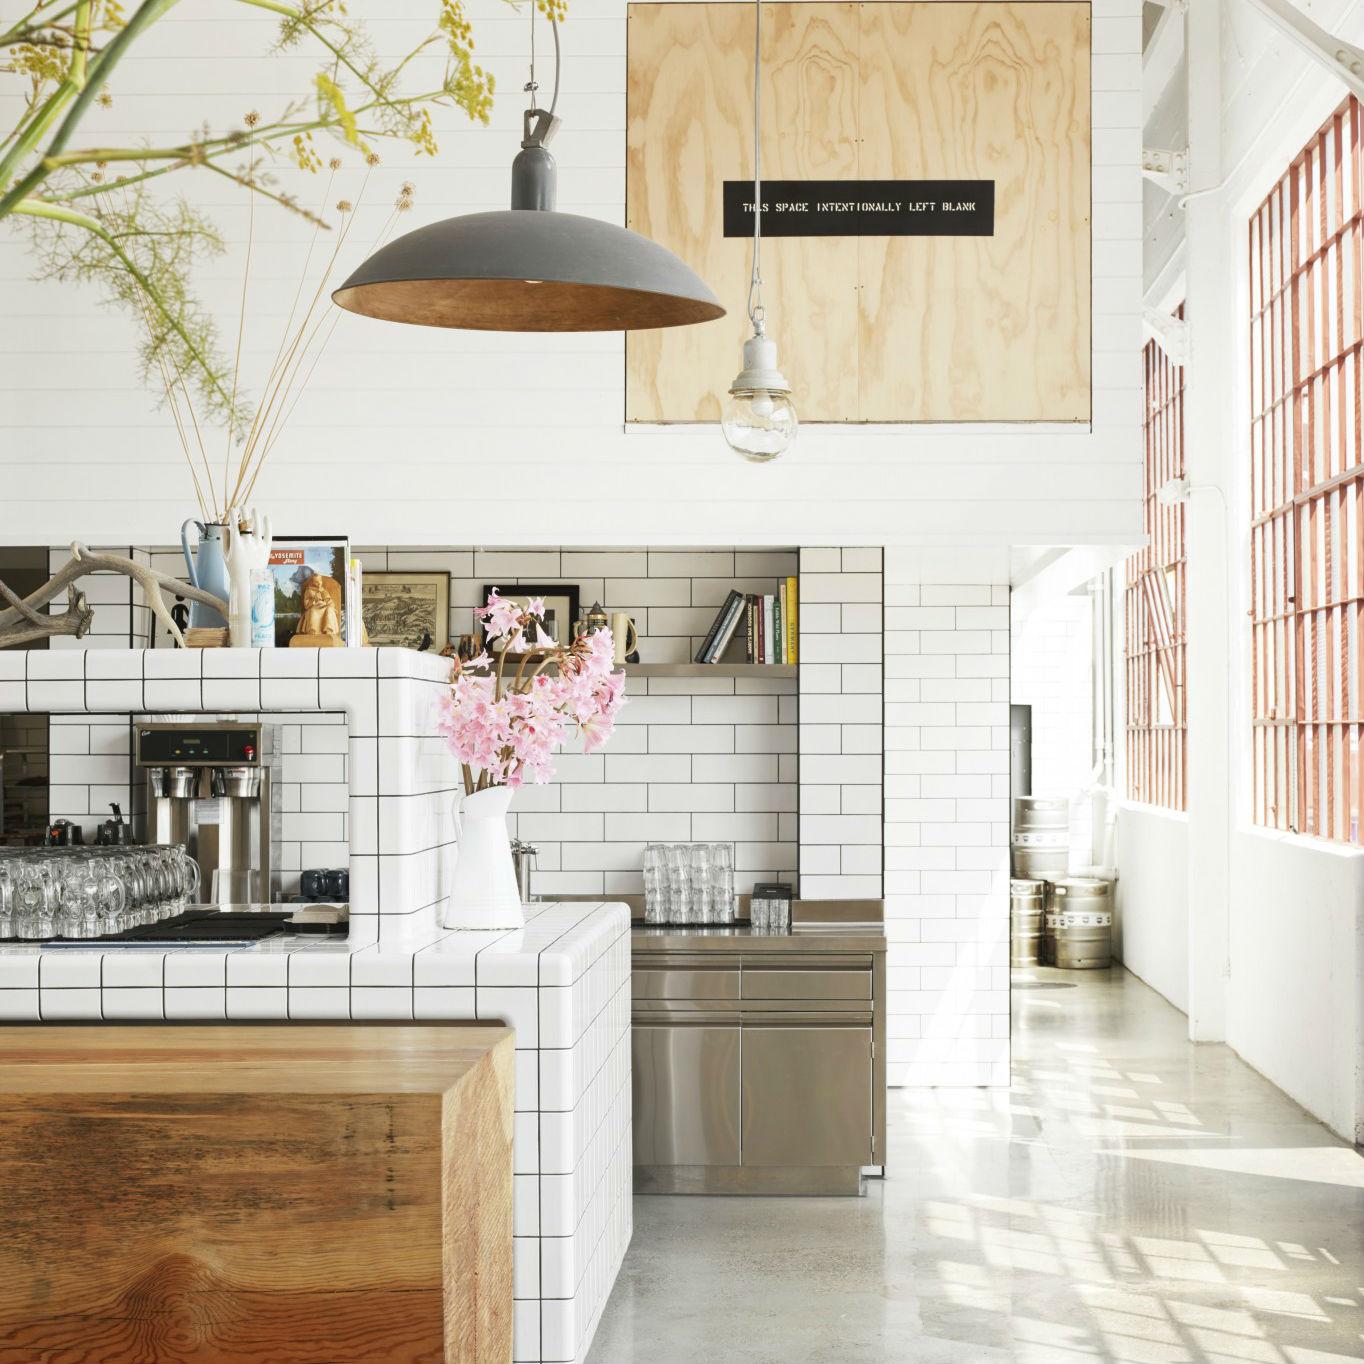 Radhaus by envelope A+D | Dezeen Awards